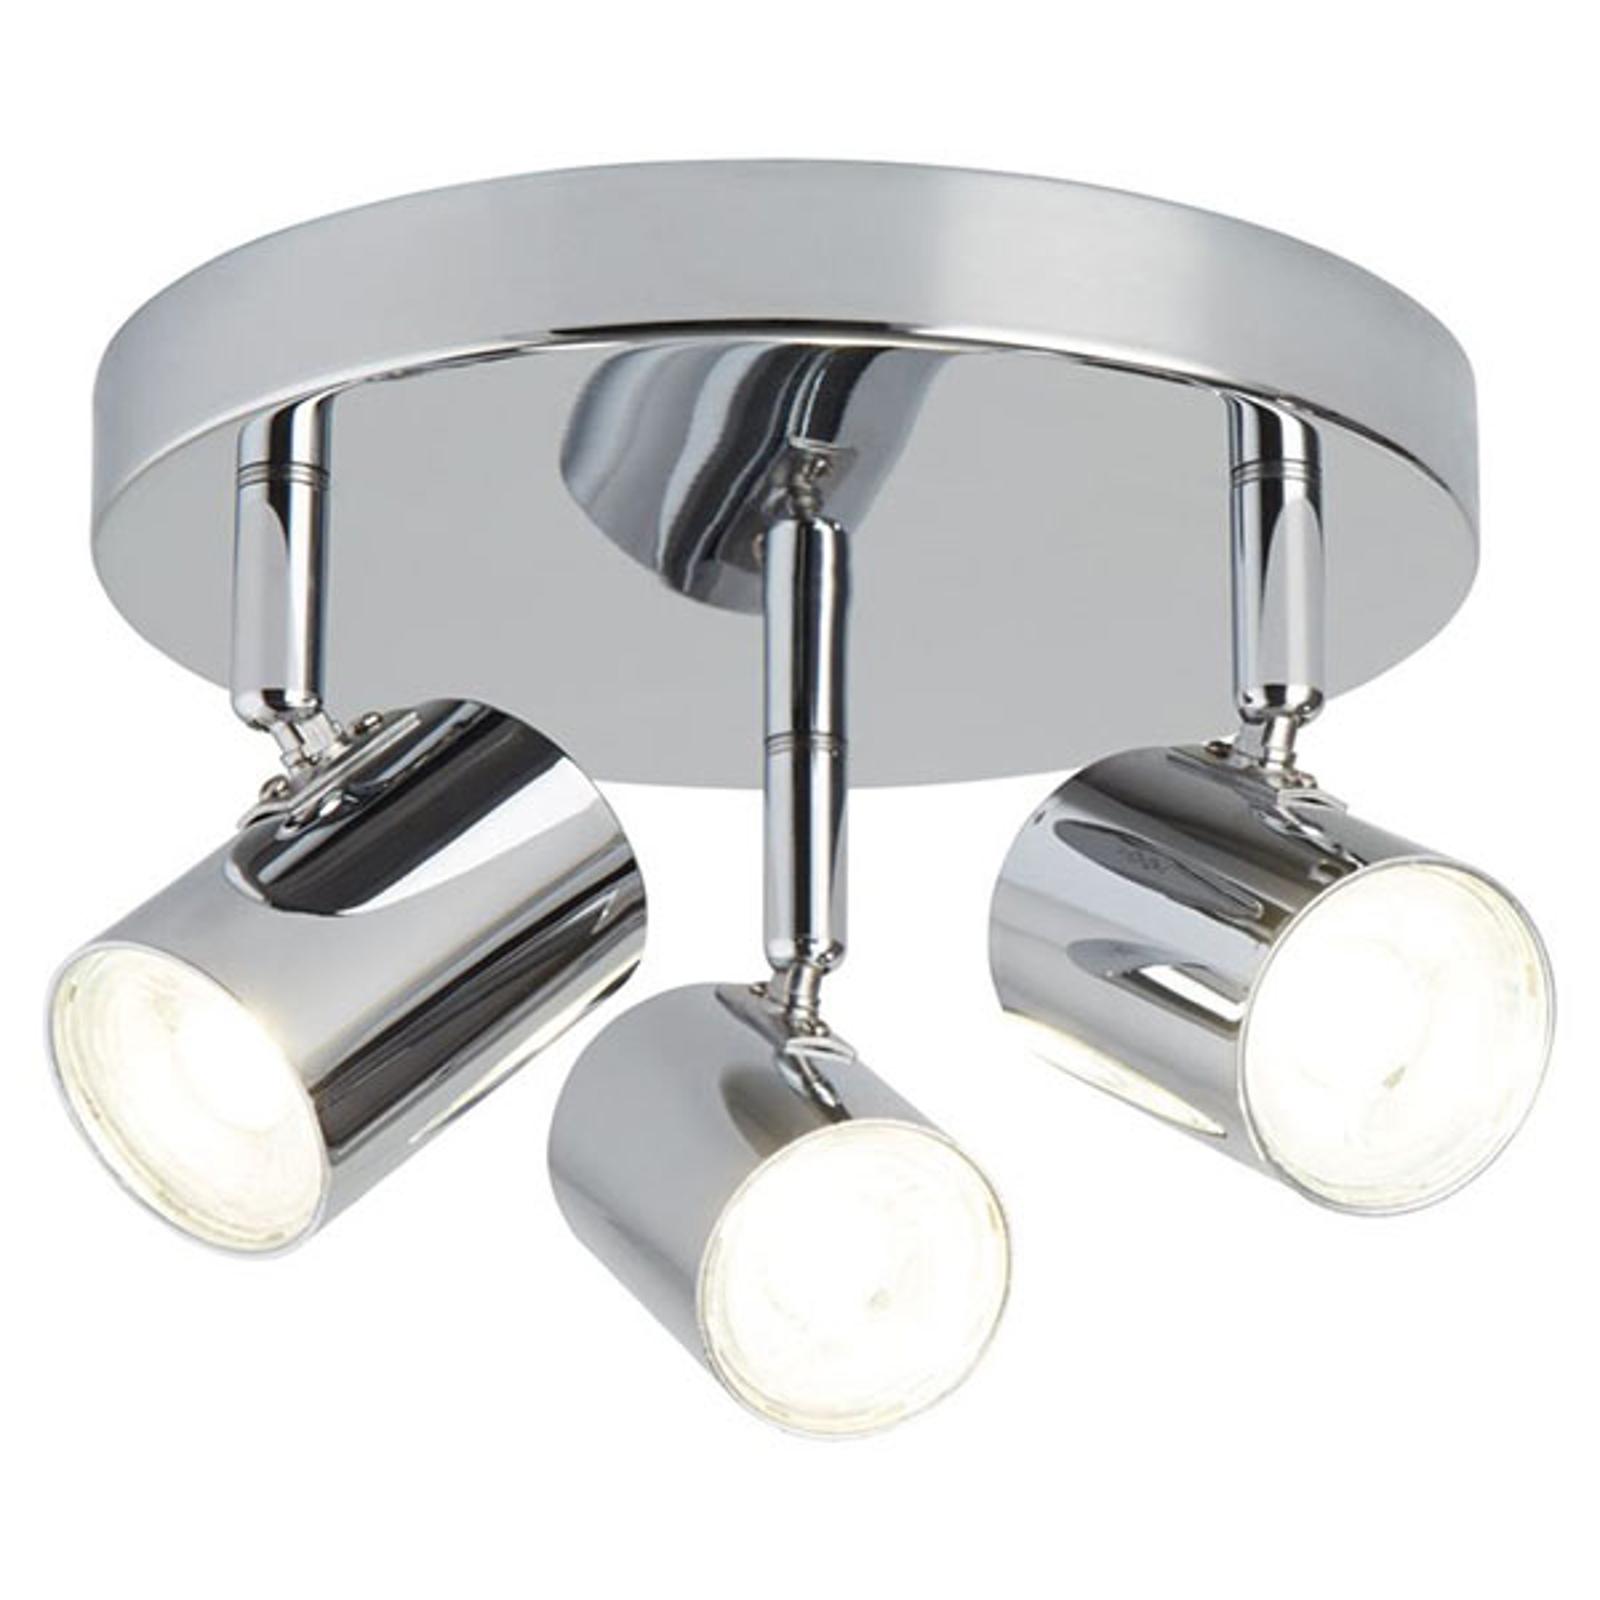 LED plafondlamp Rollo, 3-lamps, chroom